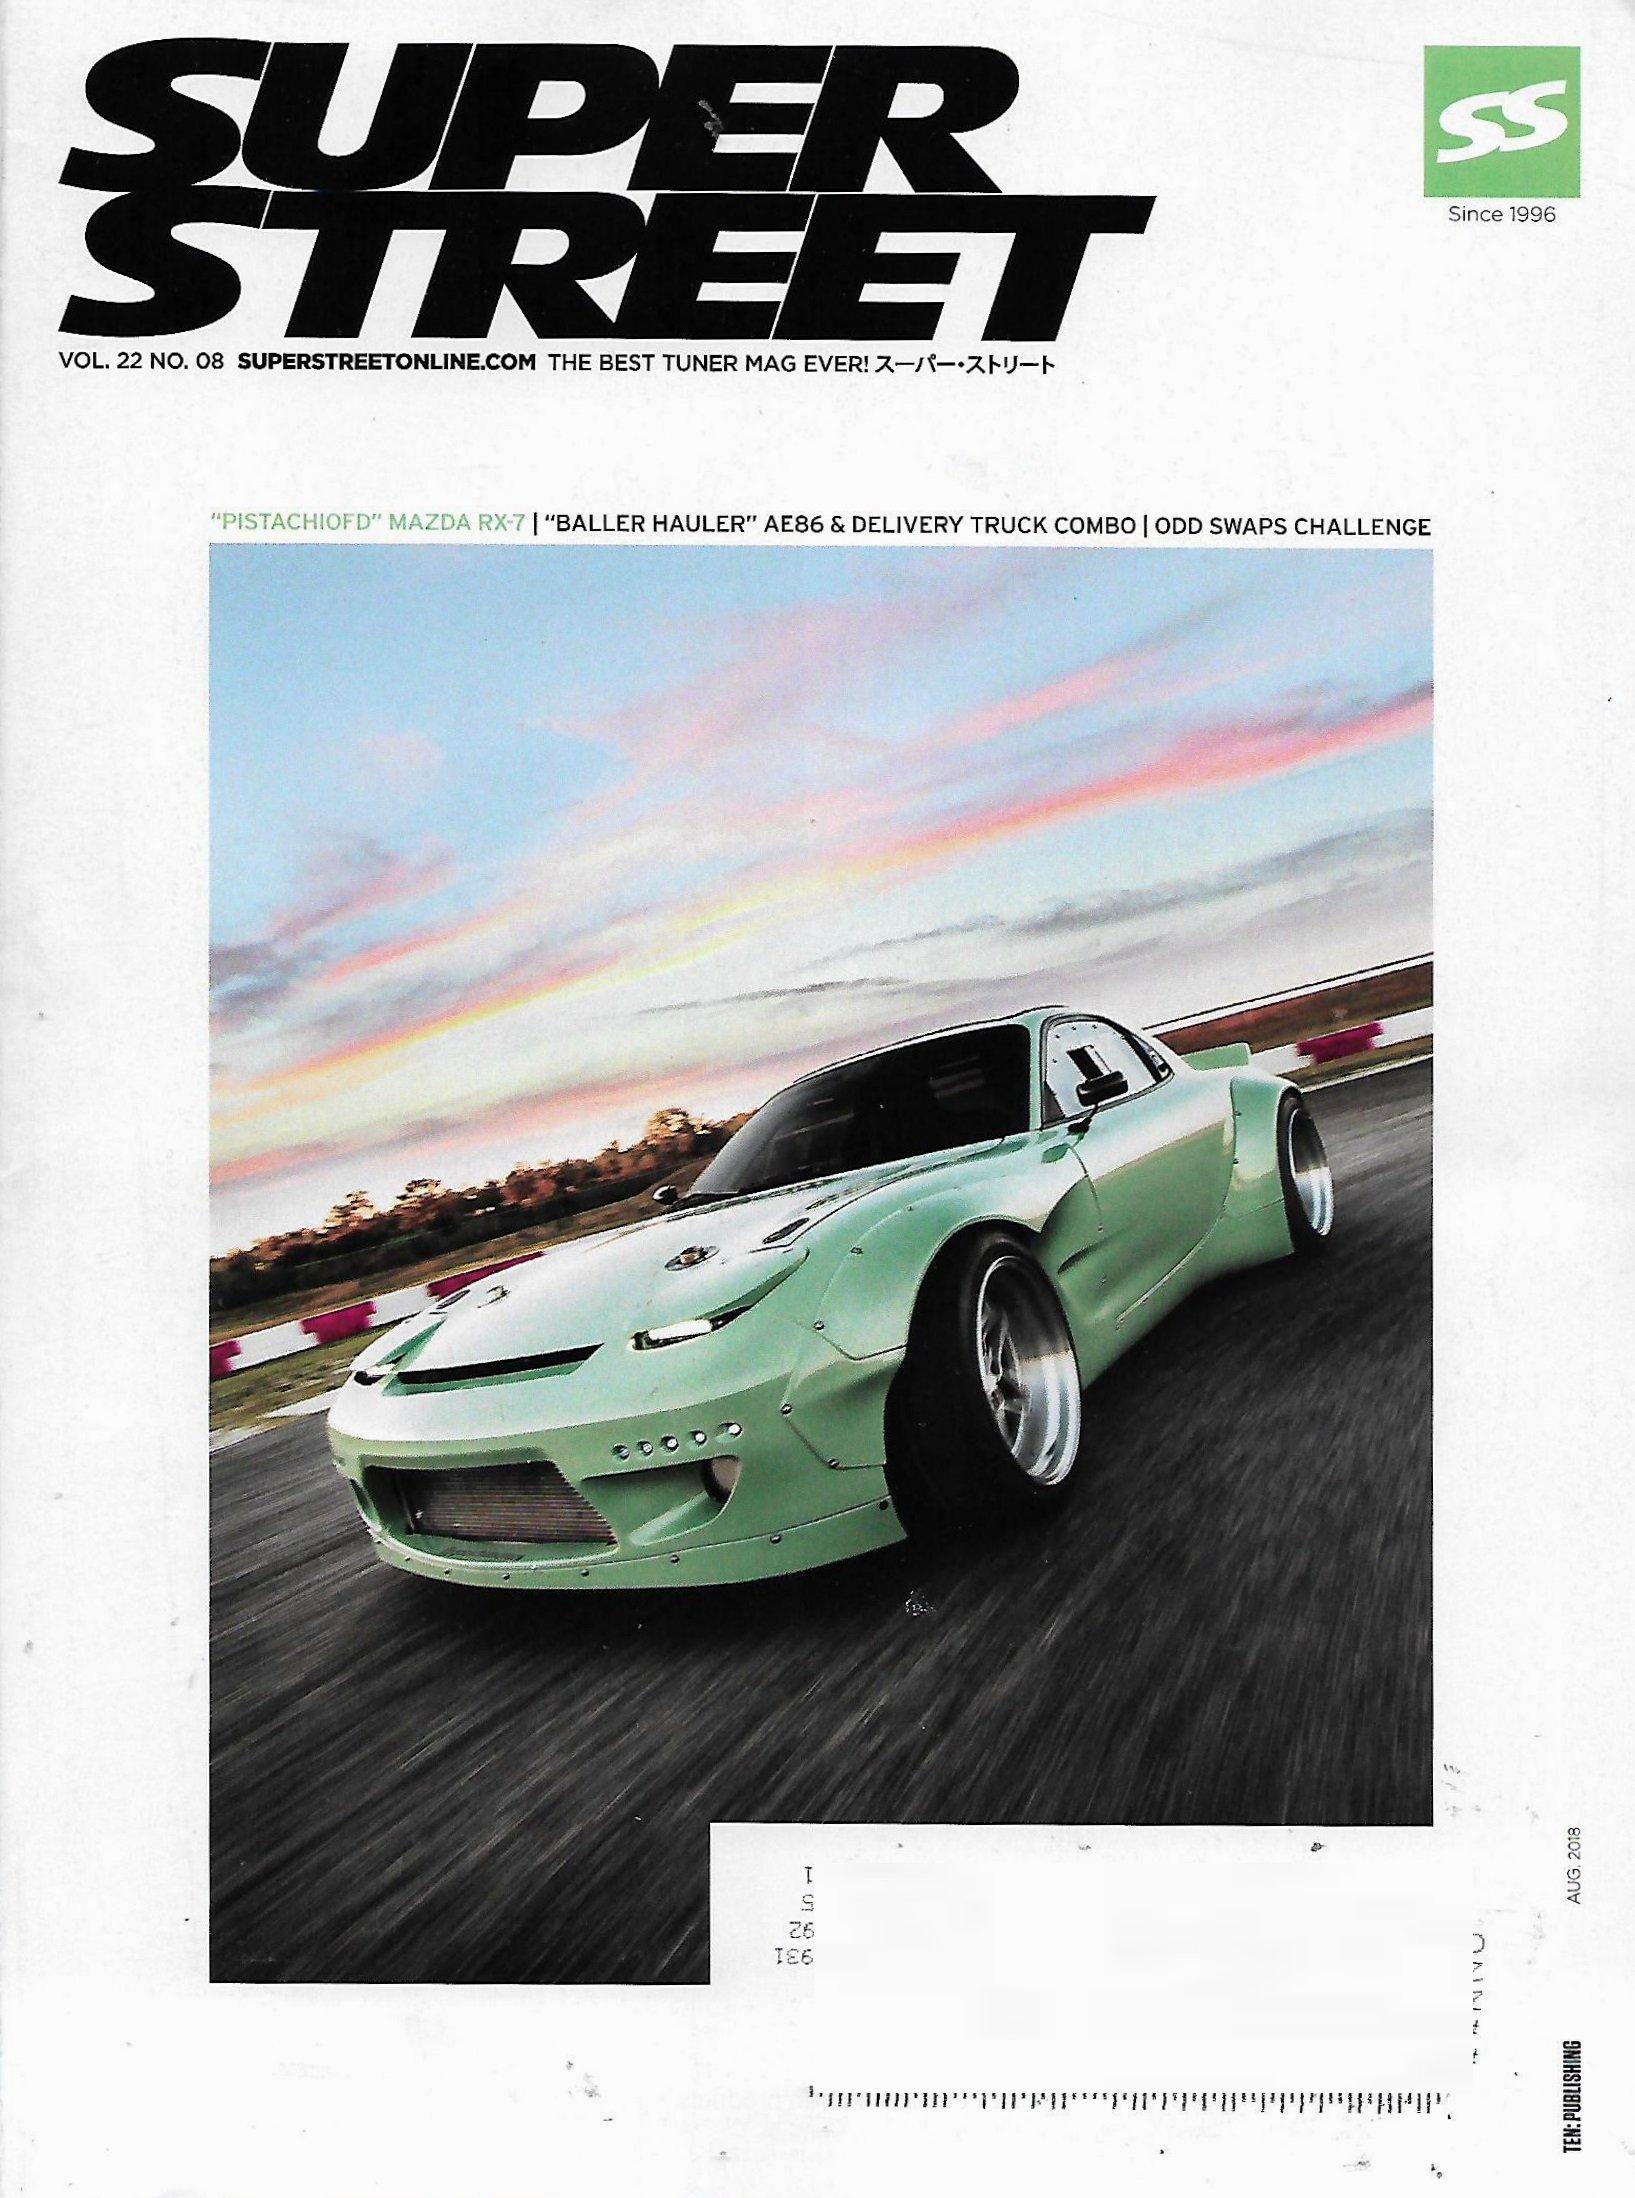 SUPER STREET Magazine August 2018 PISTACHIOFD MAZDA RX-7